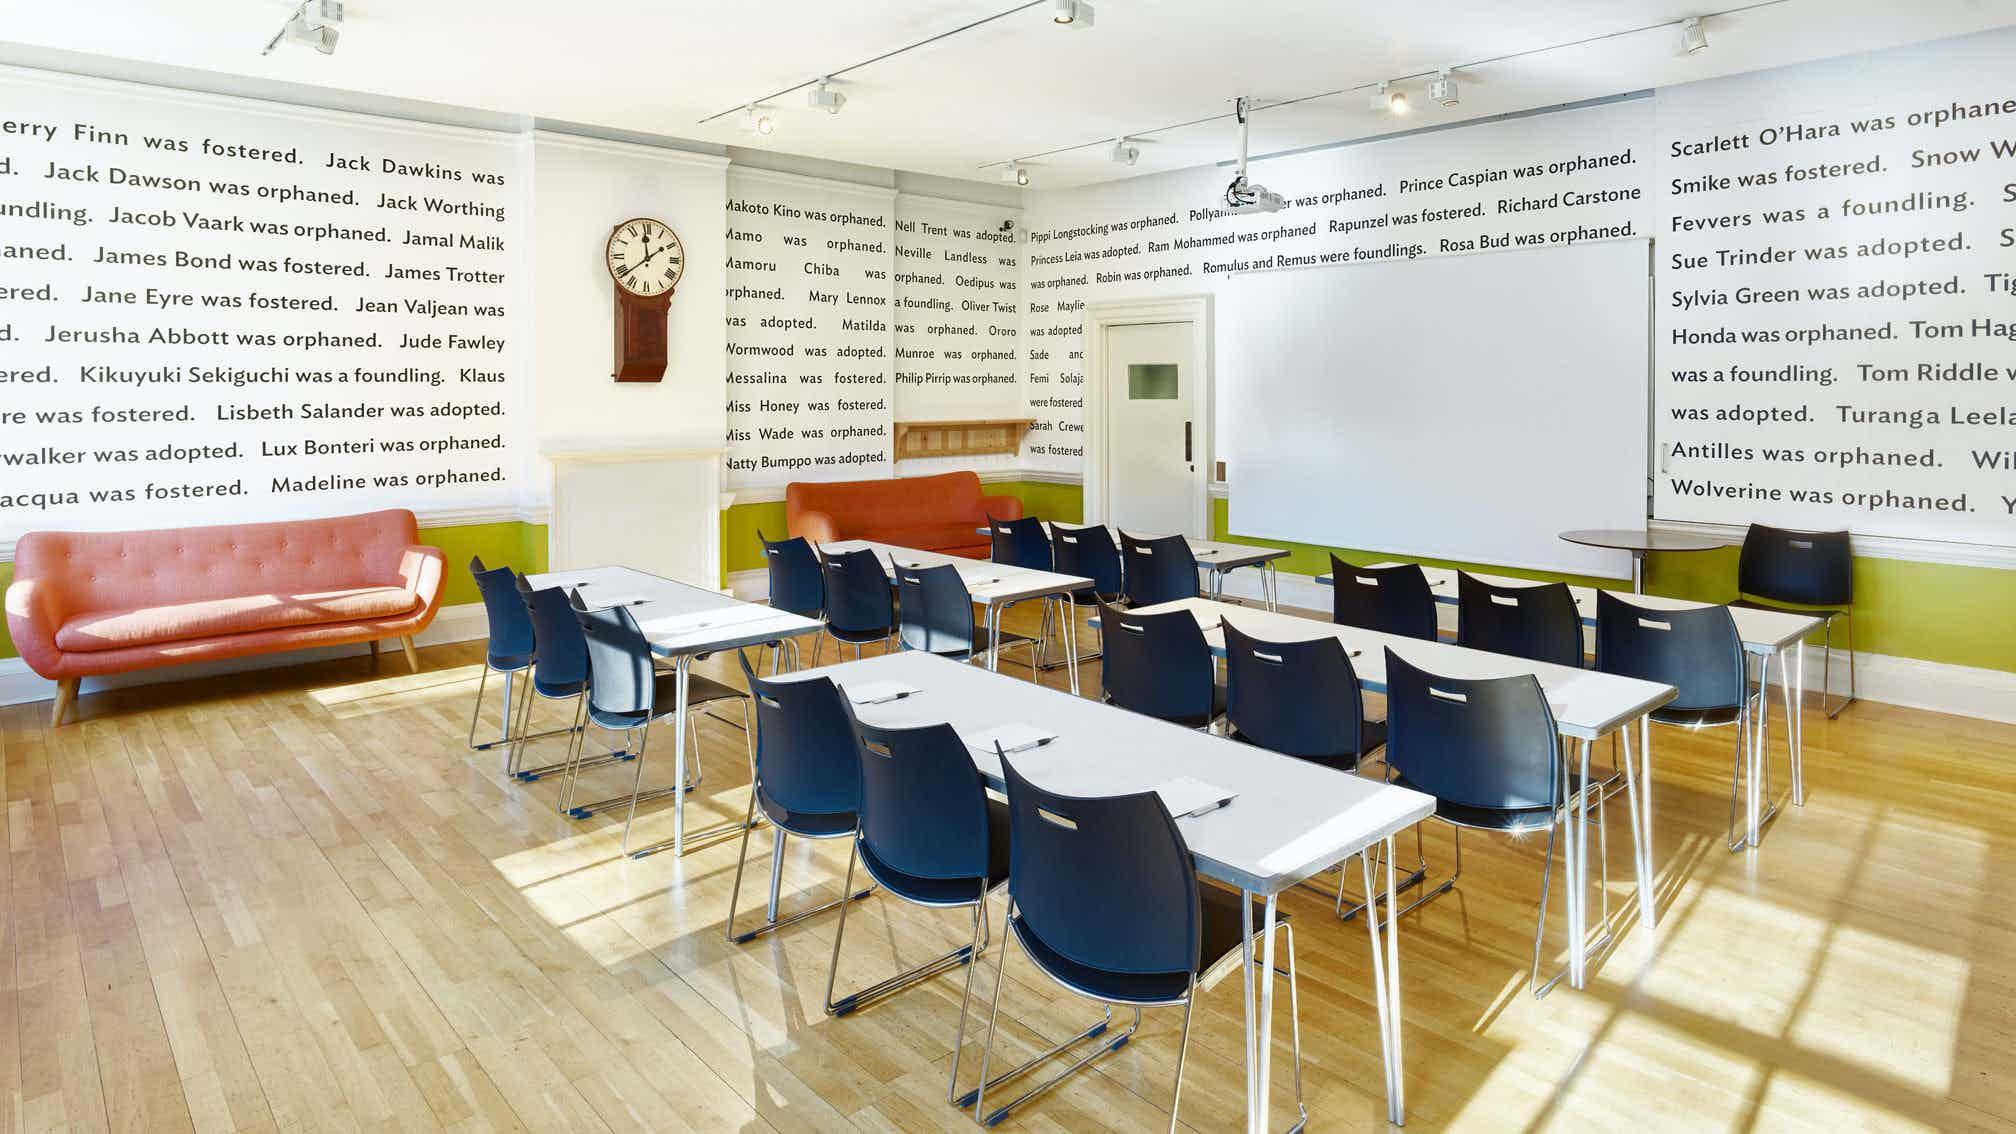 Study Studio, The Foundling Museum